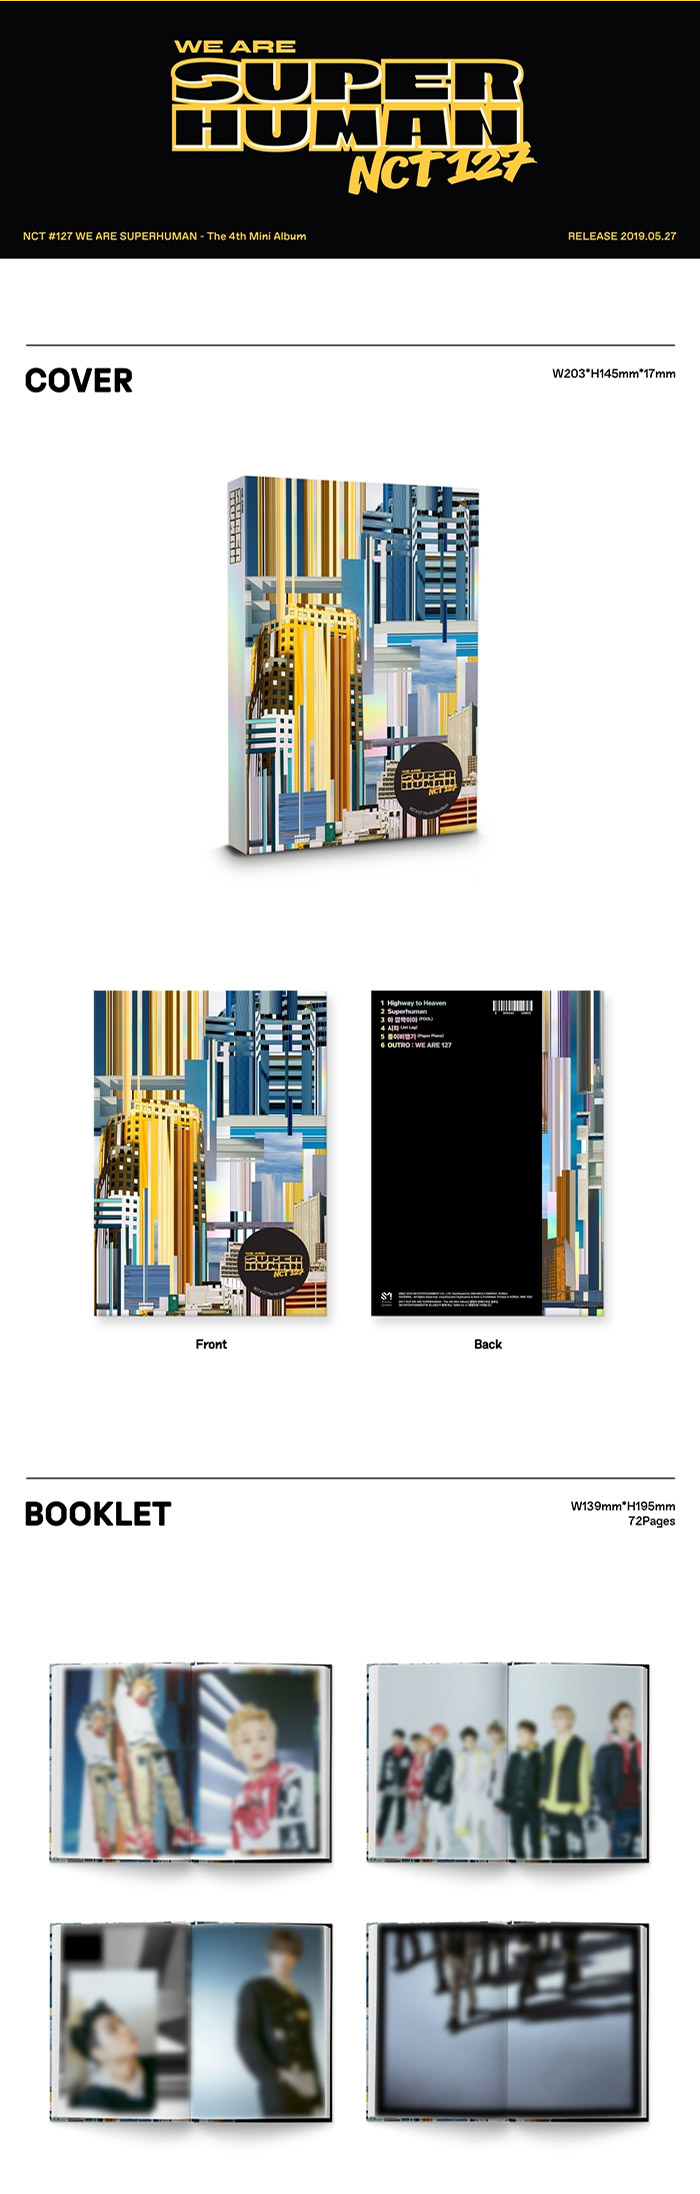 NCT 127 4th Mini Album - WE ARE SUPERHUMAN CD + 2Poster